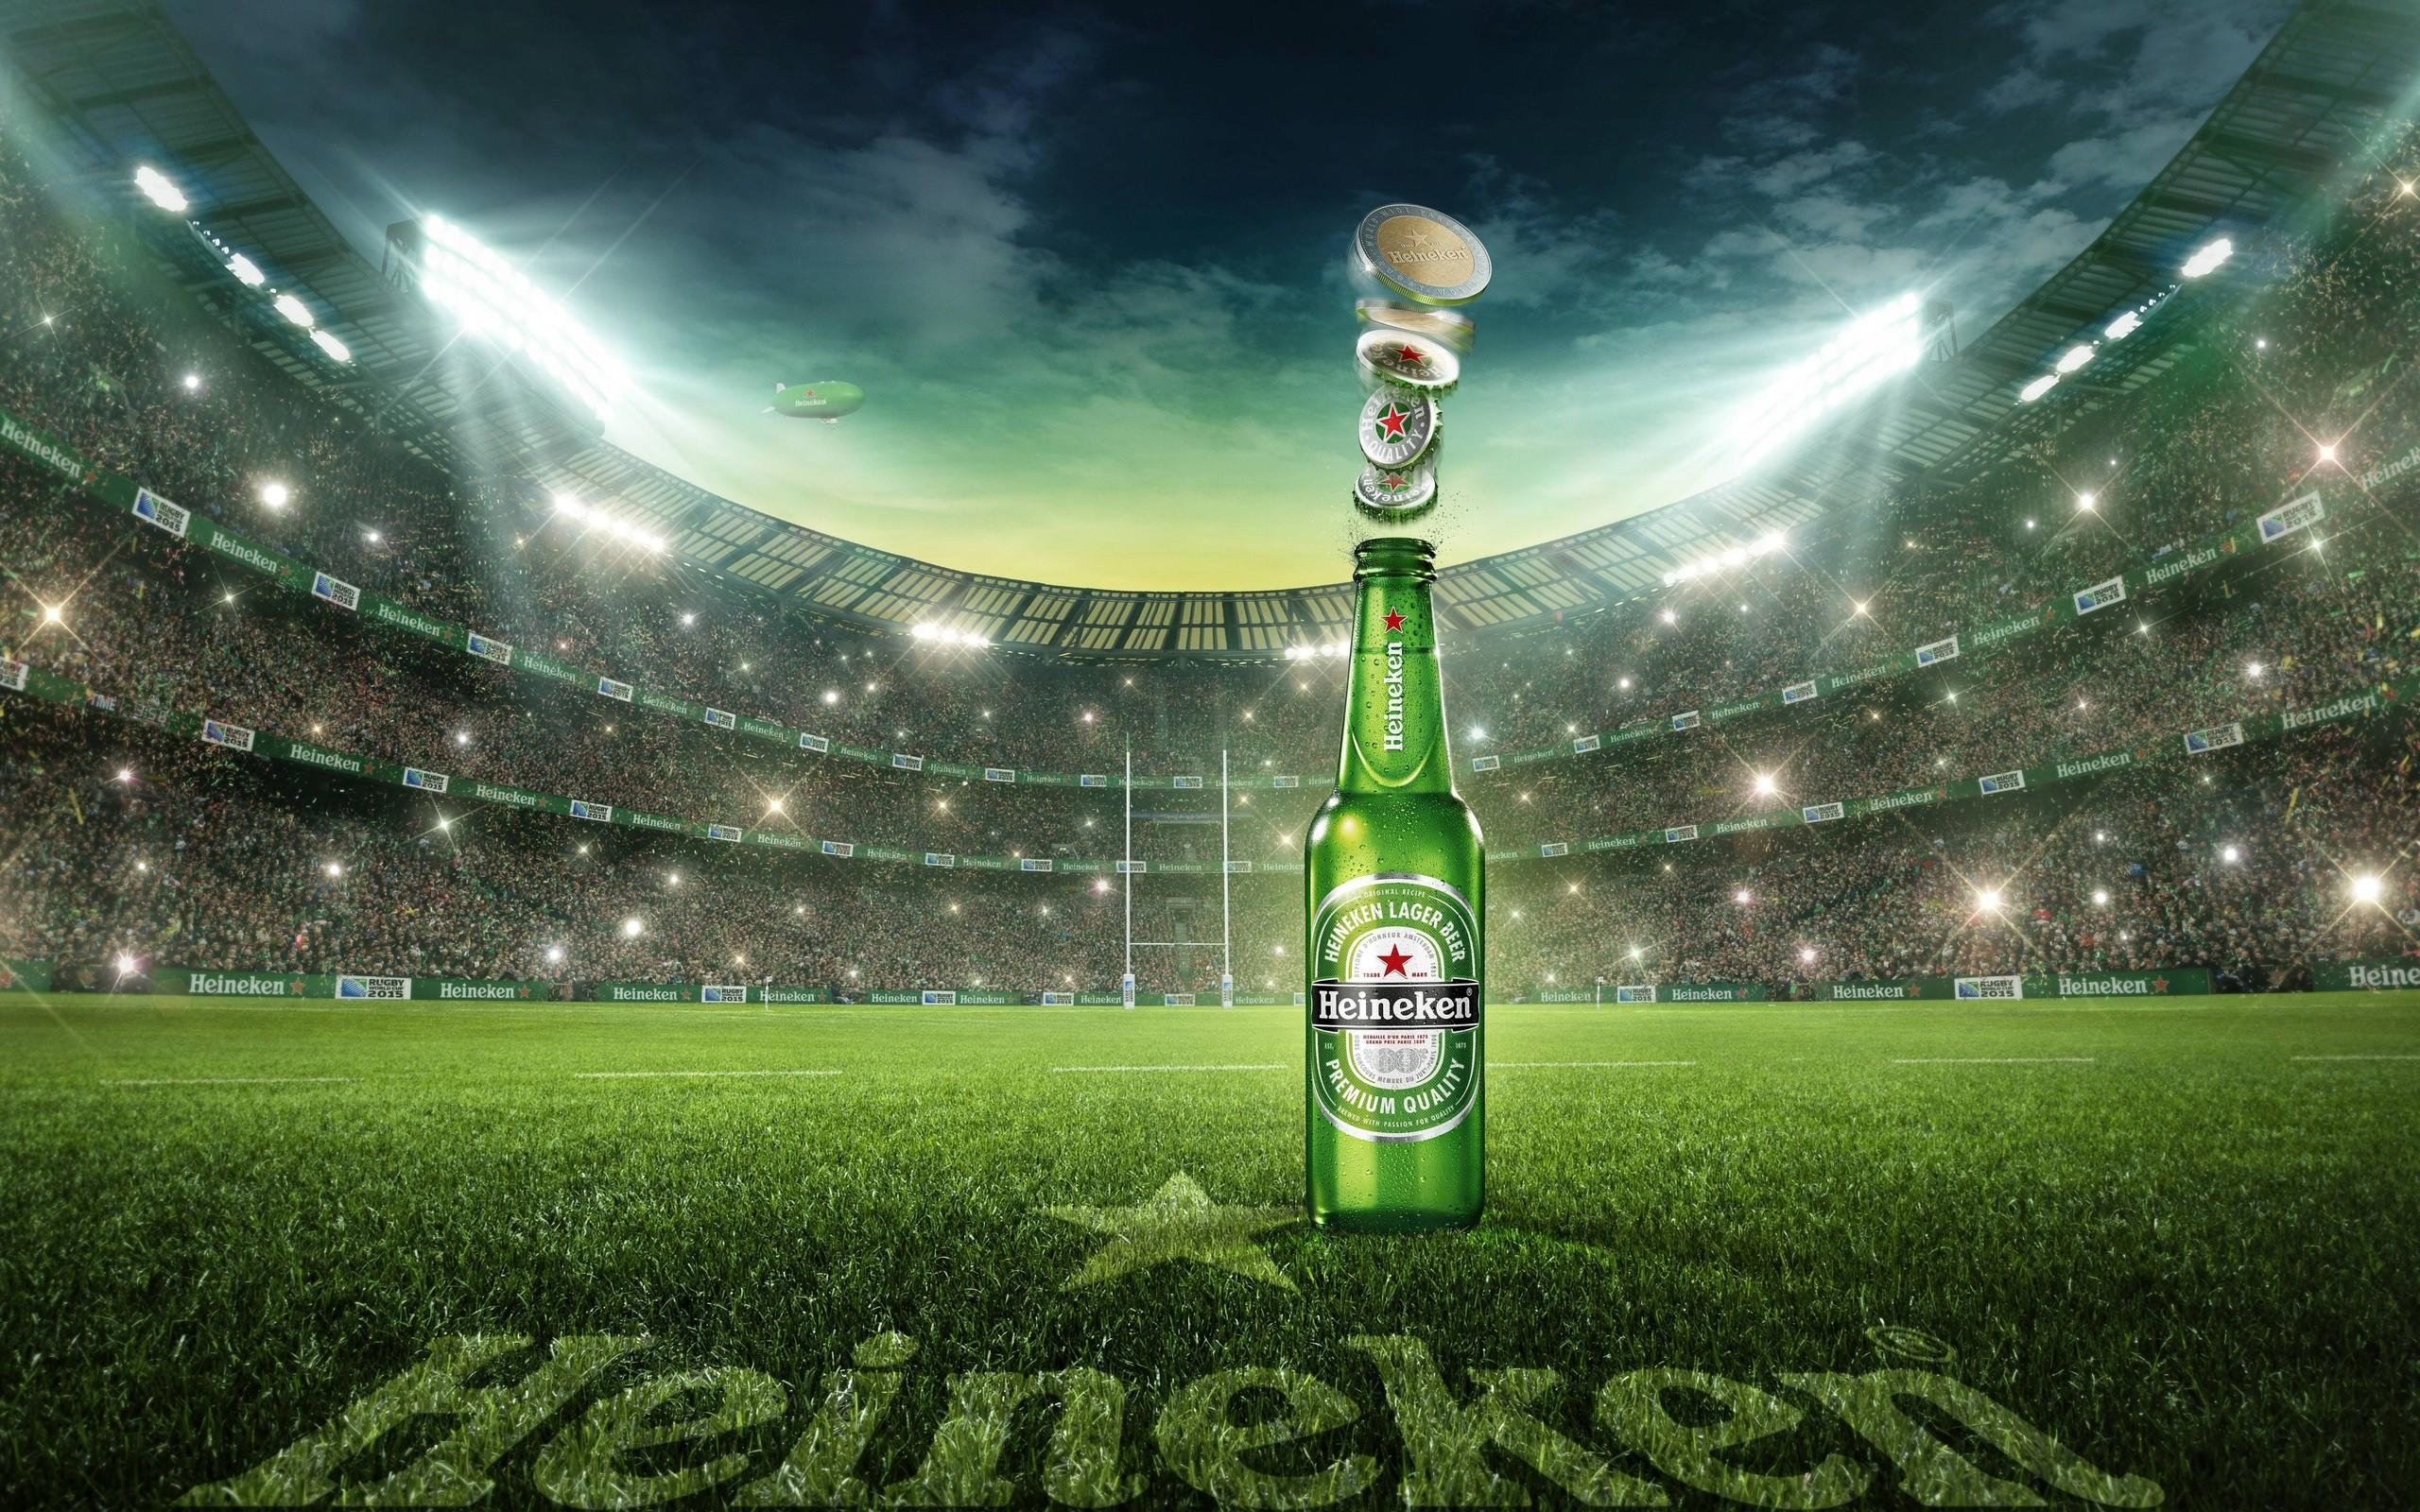 Football Stadium Background Hd